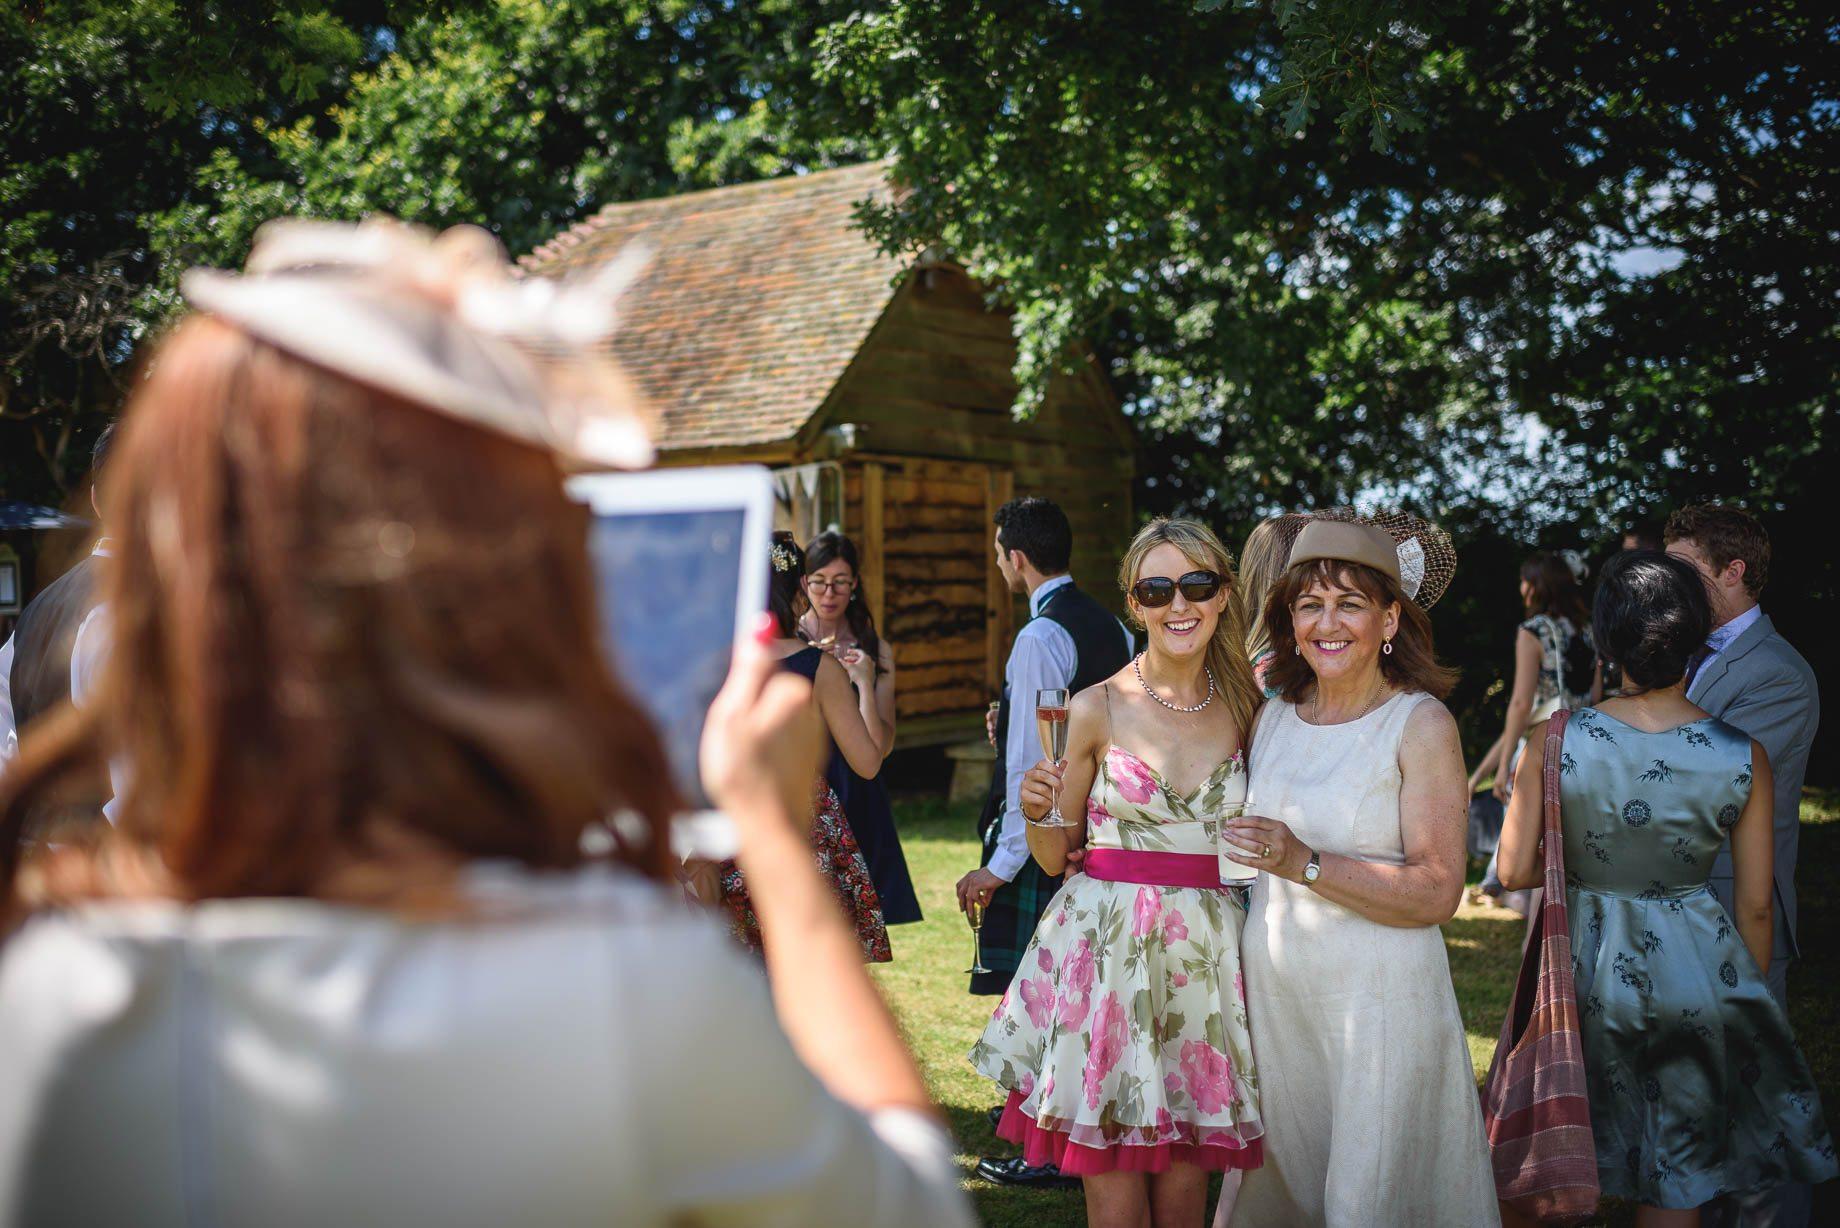 Gildings Barn wedding photography - Sarah and Steve (109 of 190)